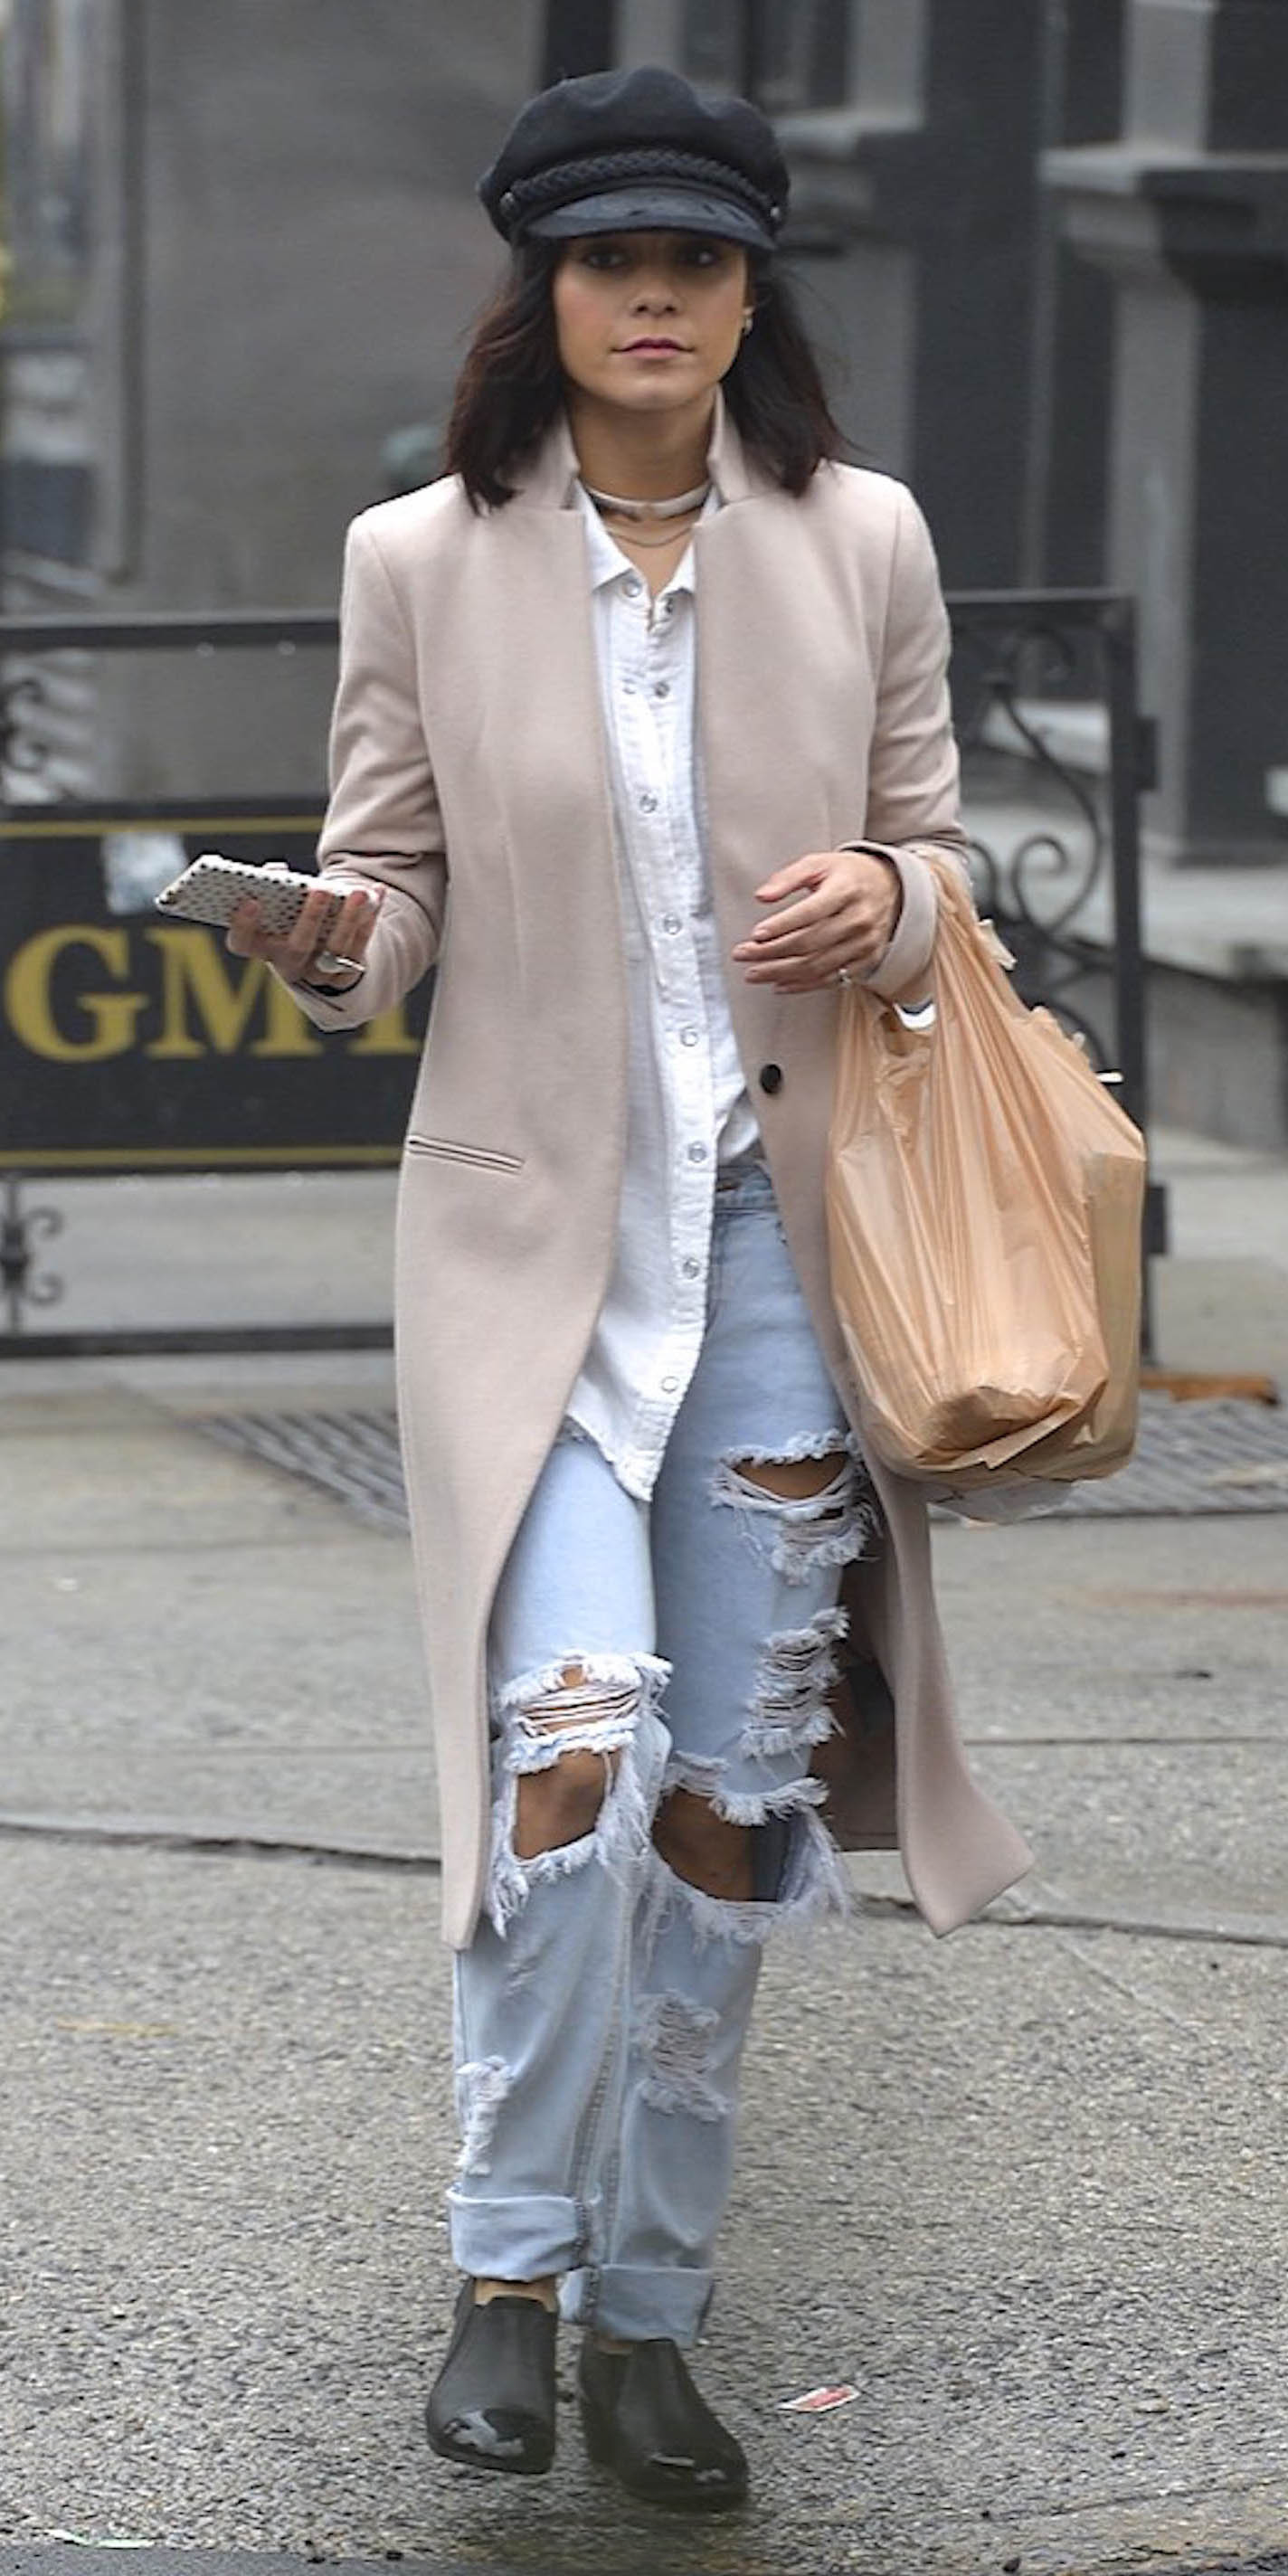 blue-light-boyfriend-jeans-white-collared-shirt-tan-jacket-coat-hat-lob-black-shoe-booties-brun-fall-winter-vanessahudgens-lunch.jpg